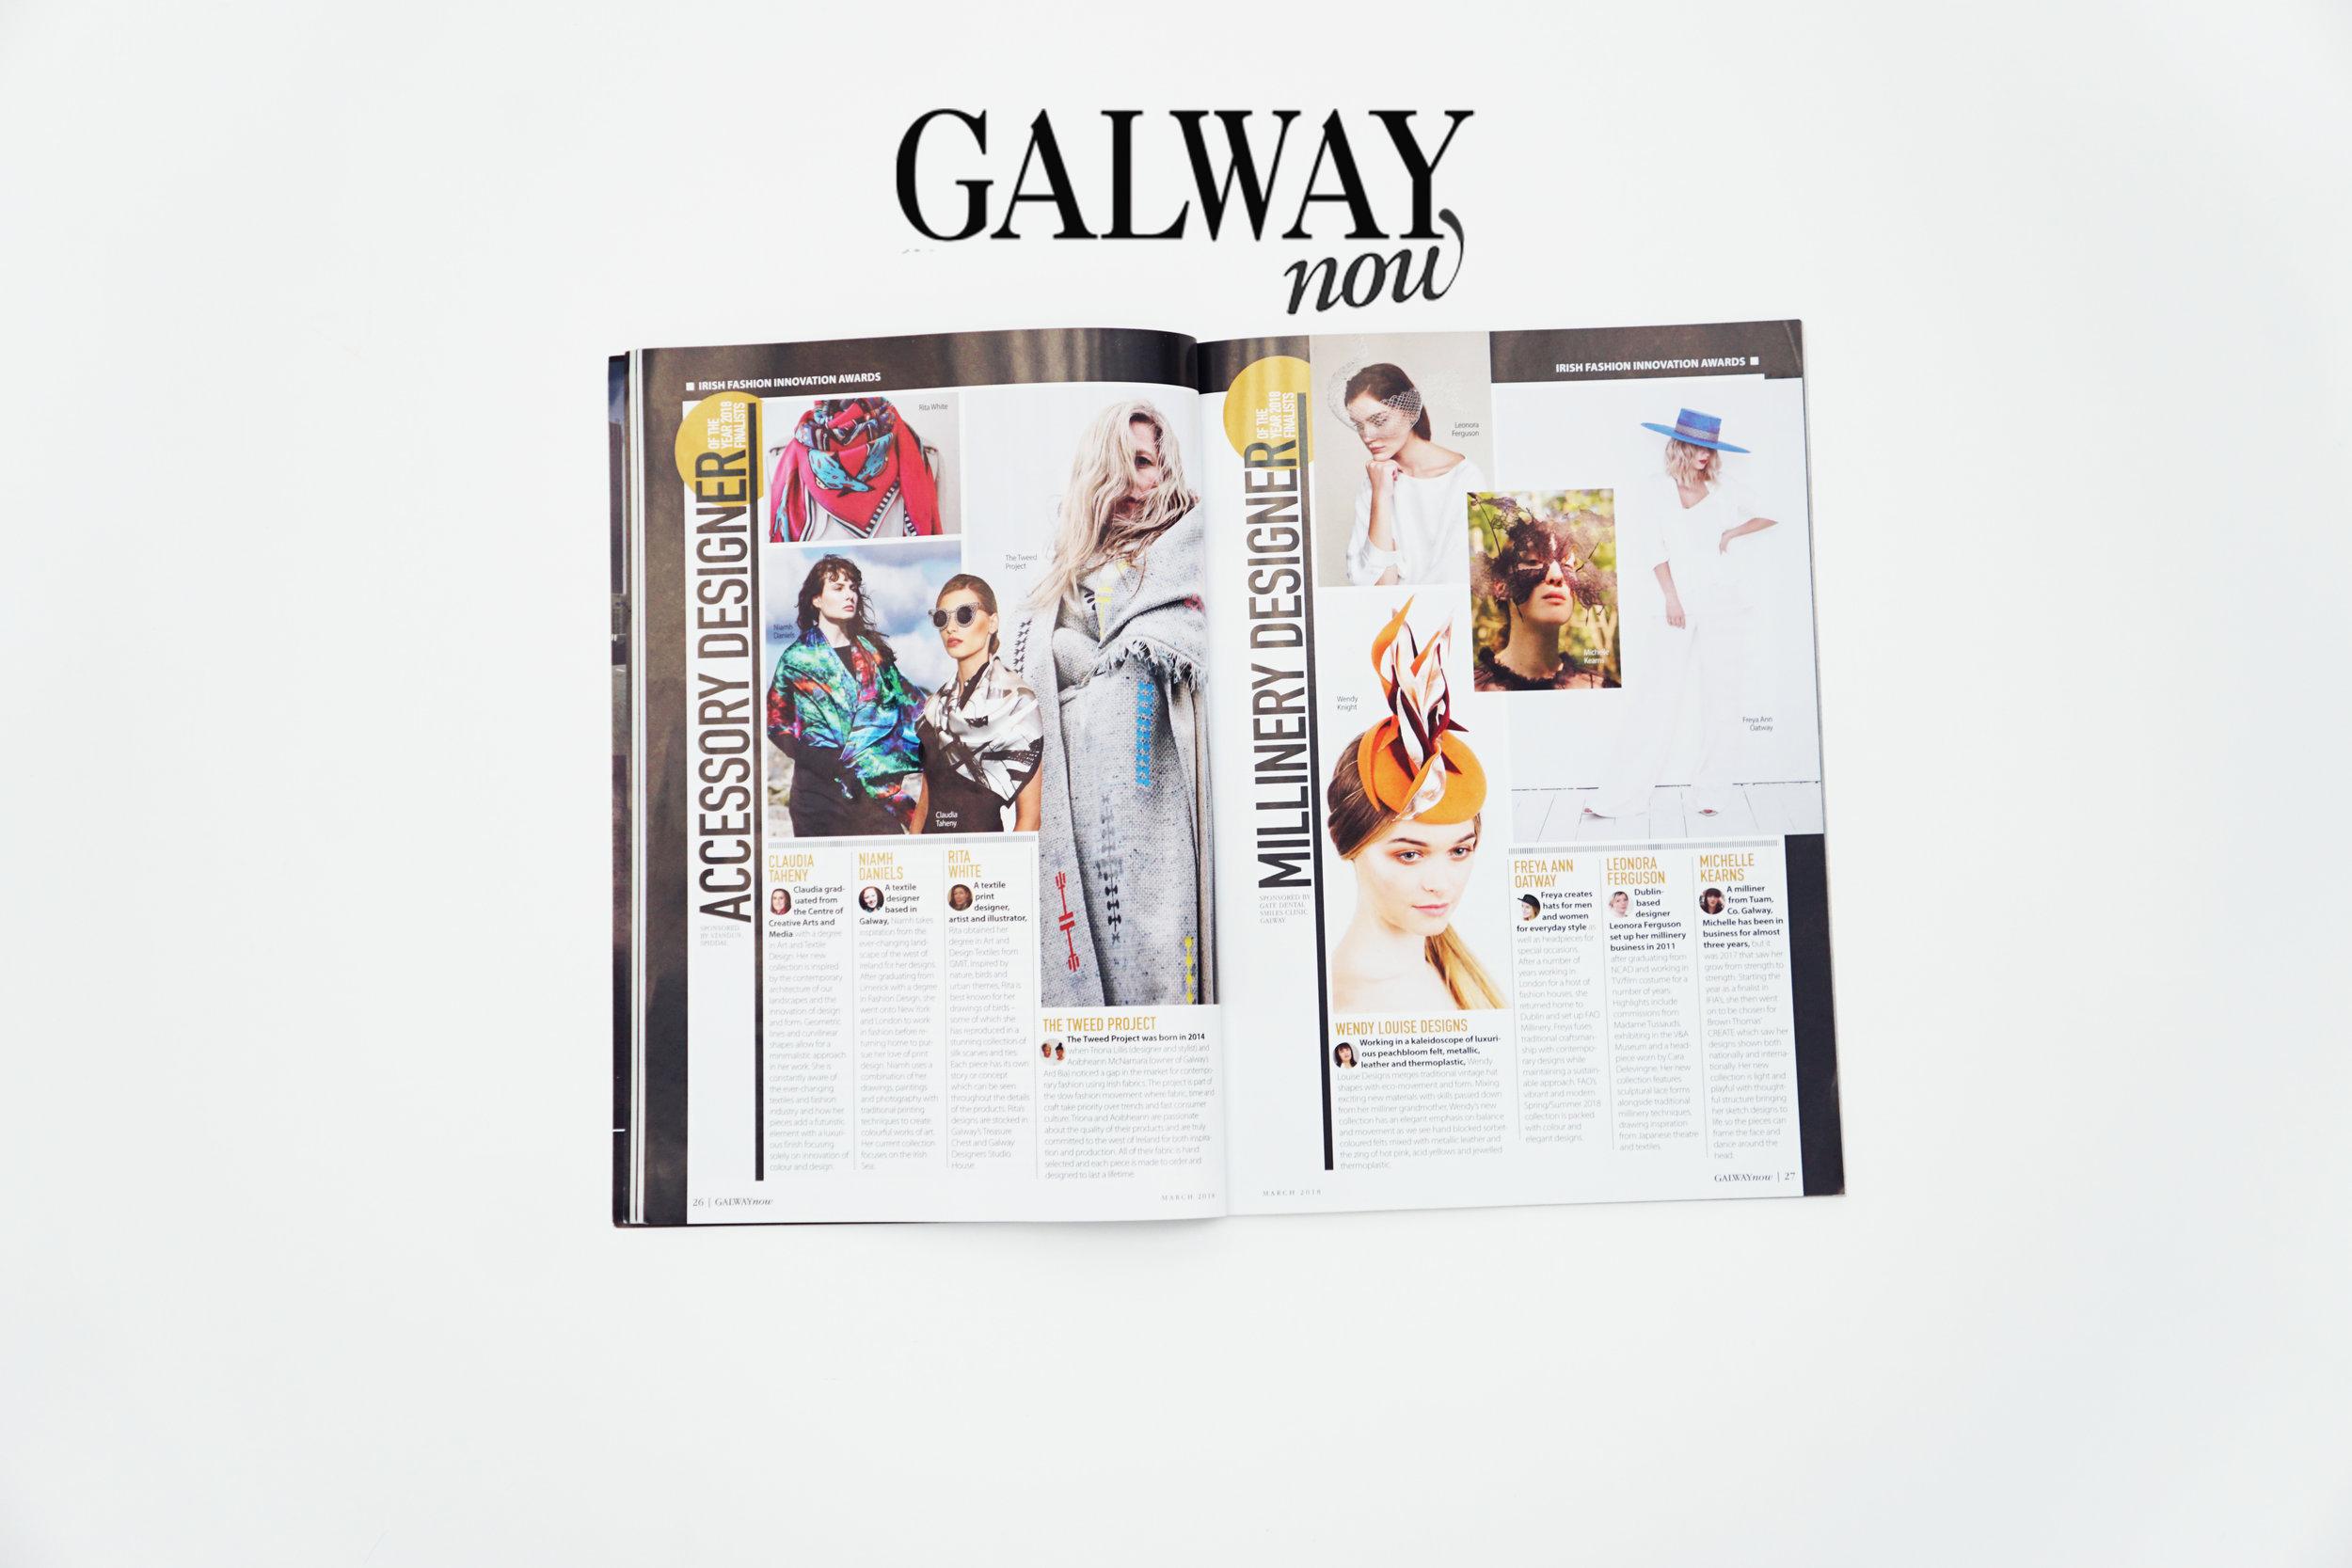 galaway.jpg